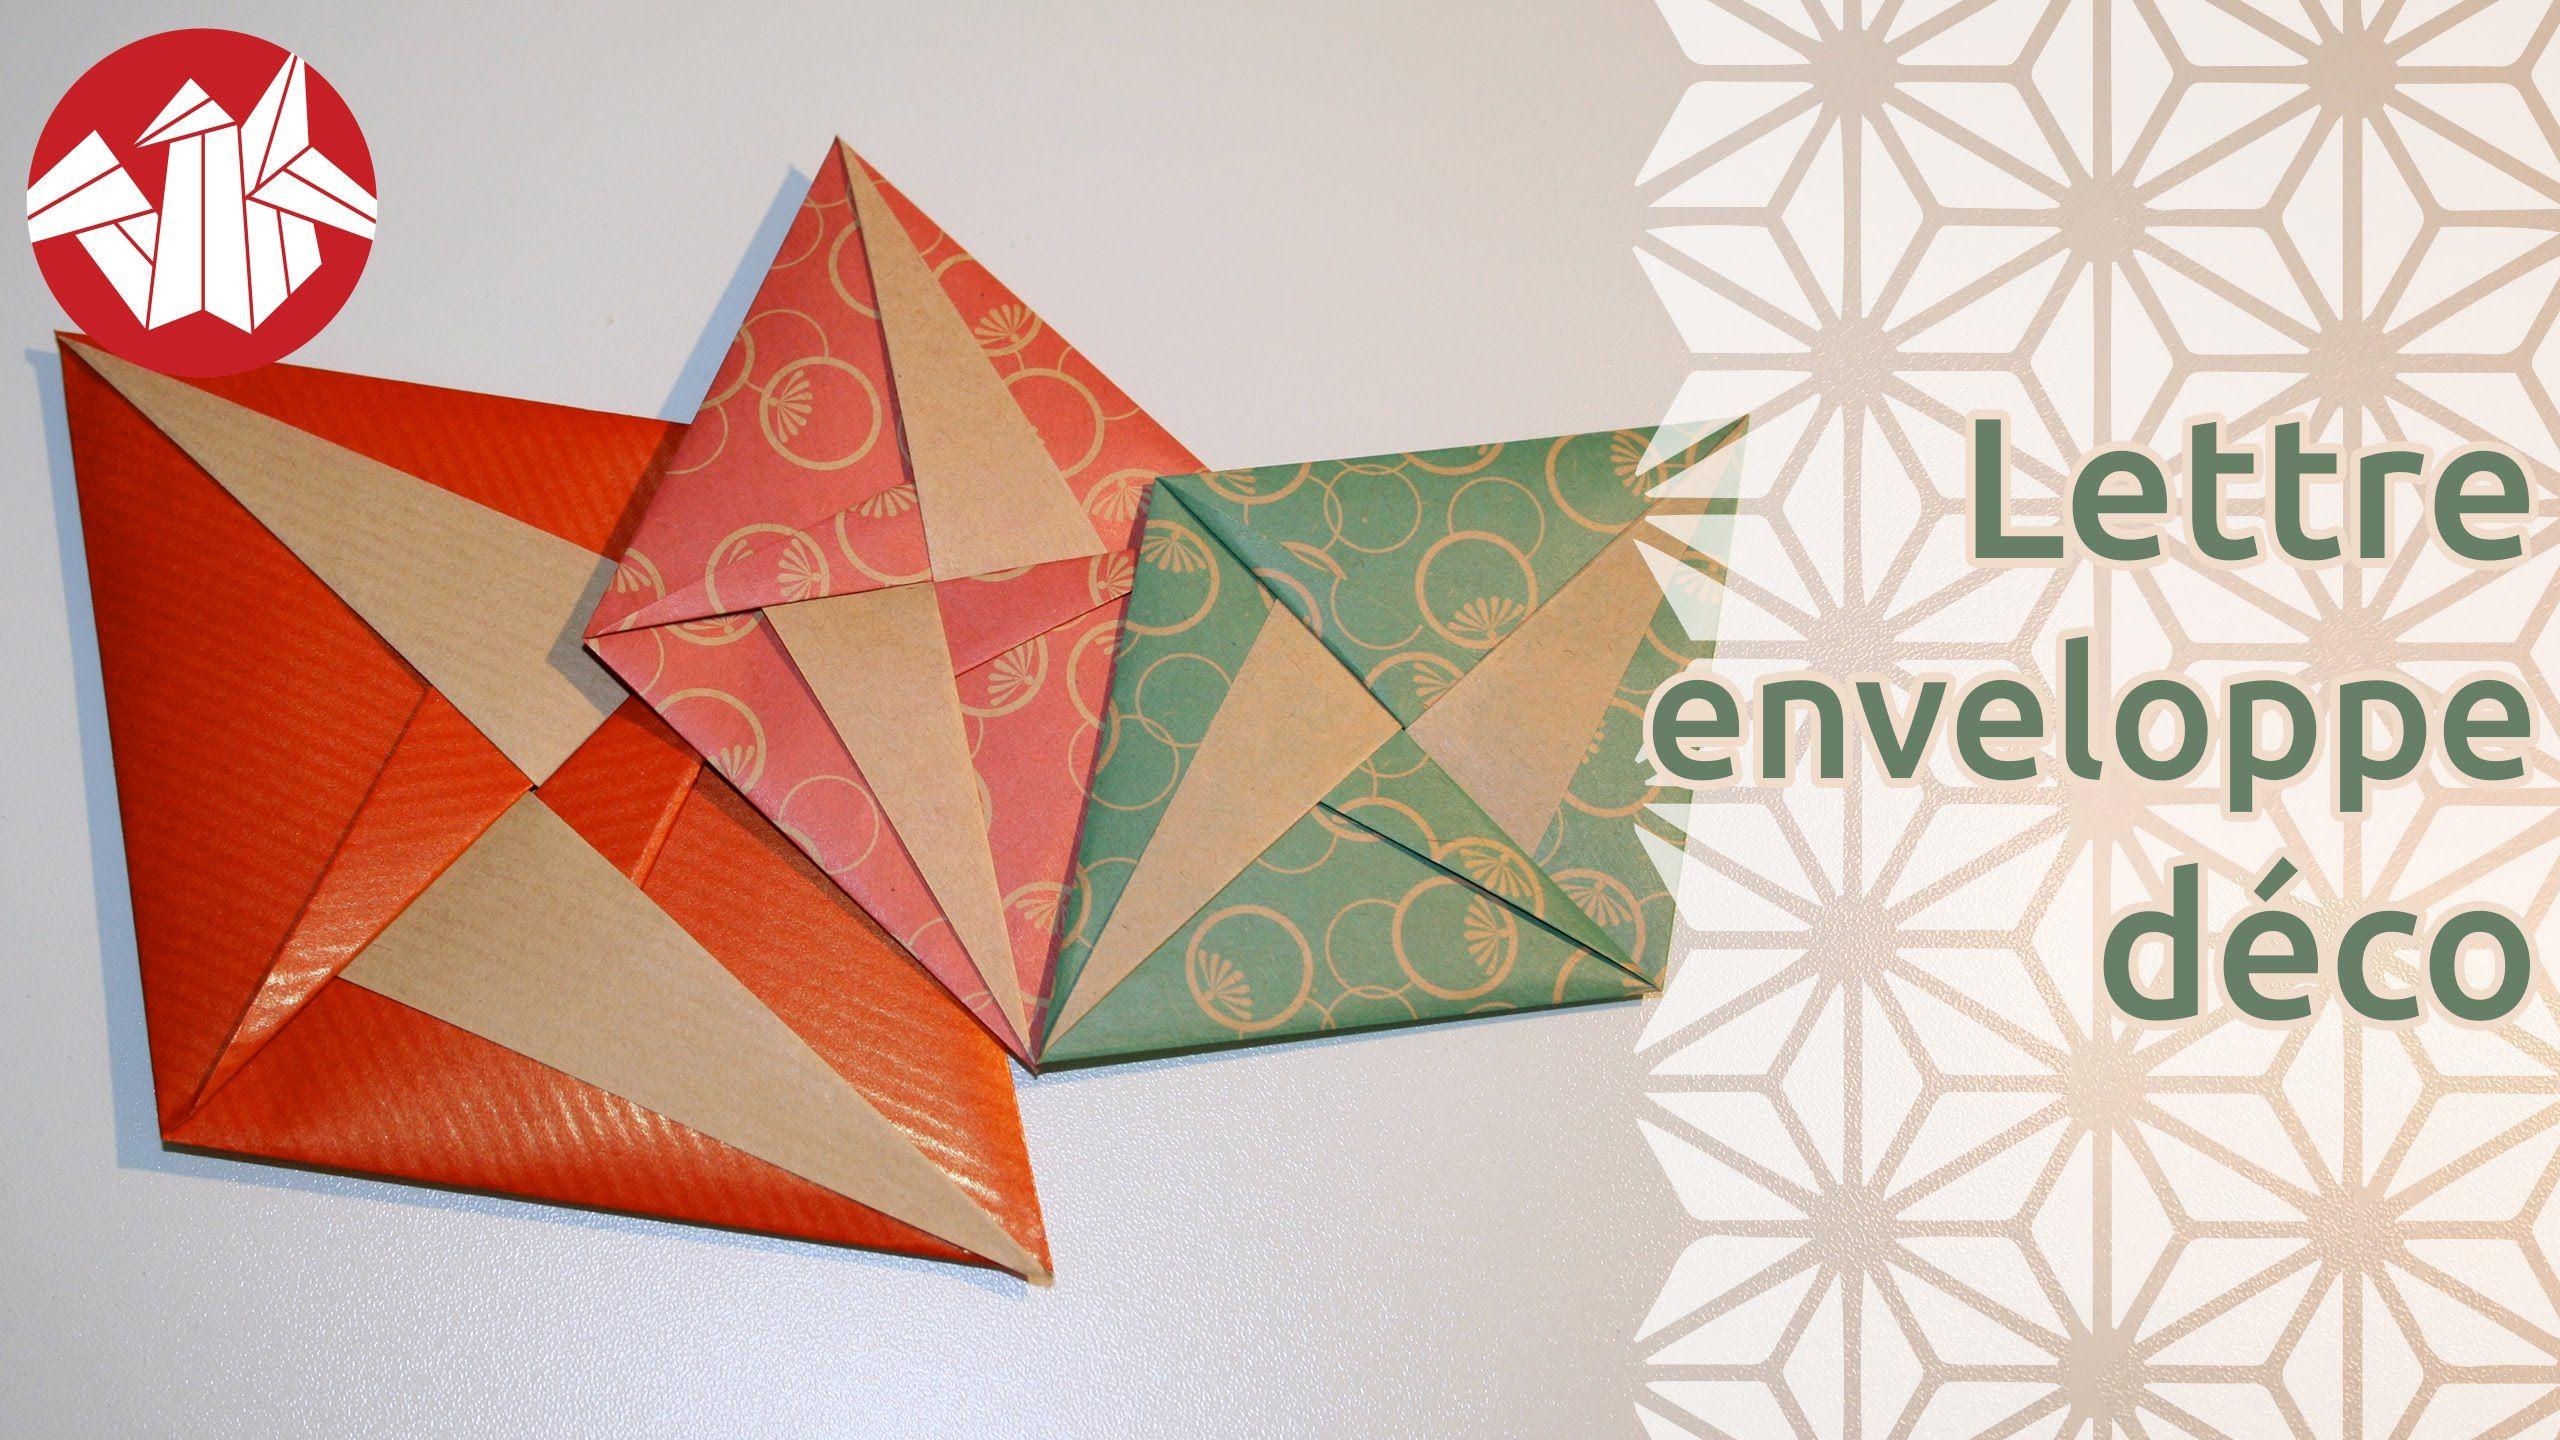 Origami  LettreEnveloppe Dco De Tomoko Fuse Senbazuru  I